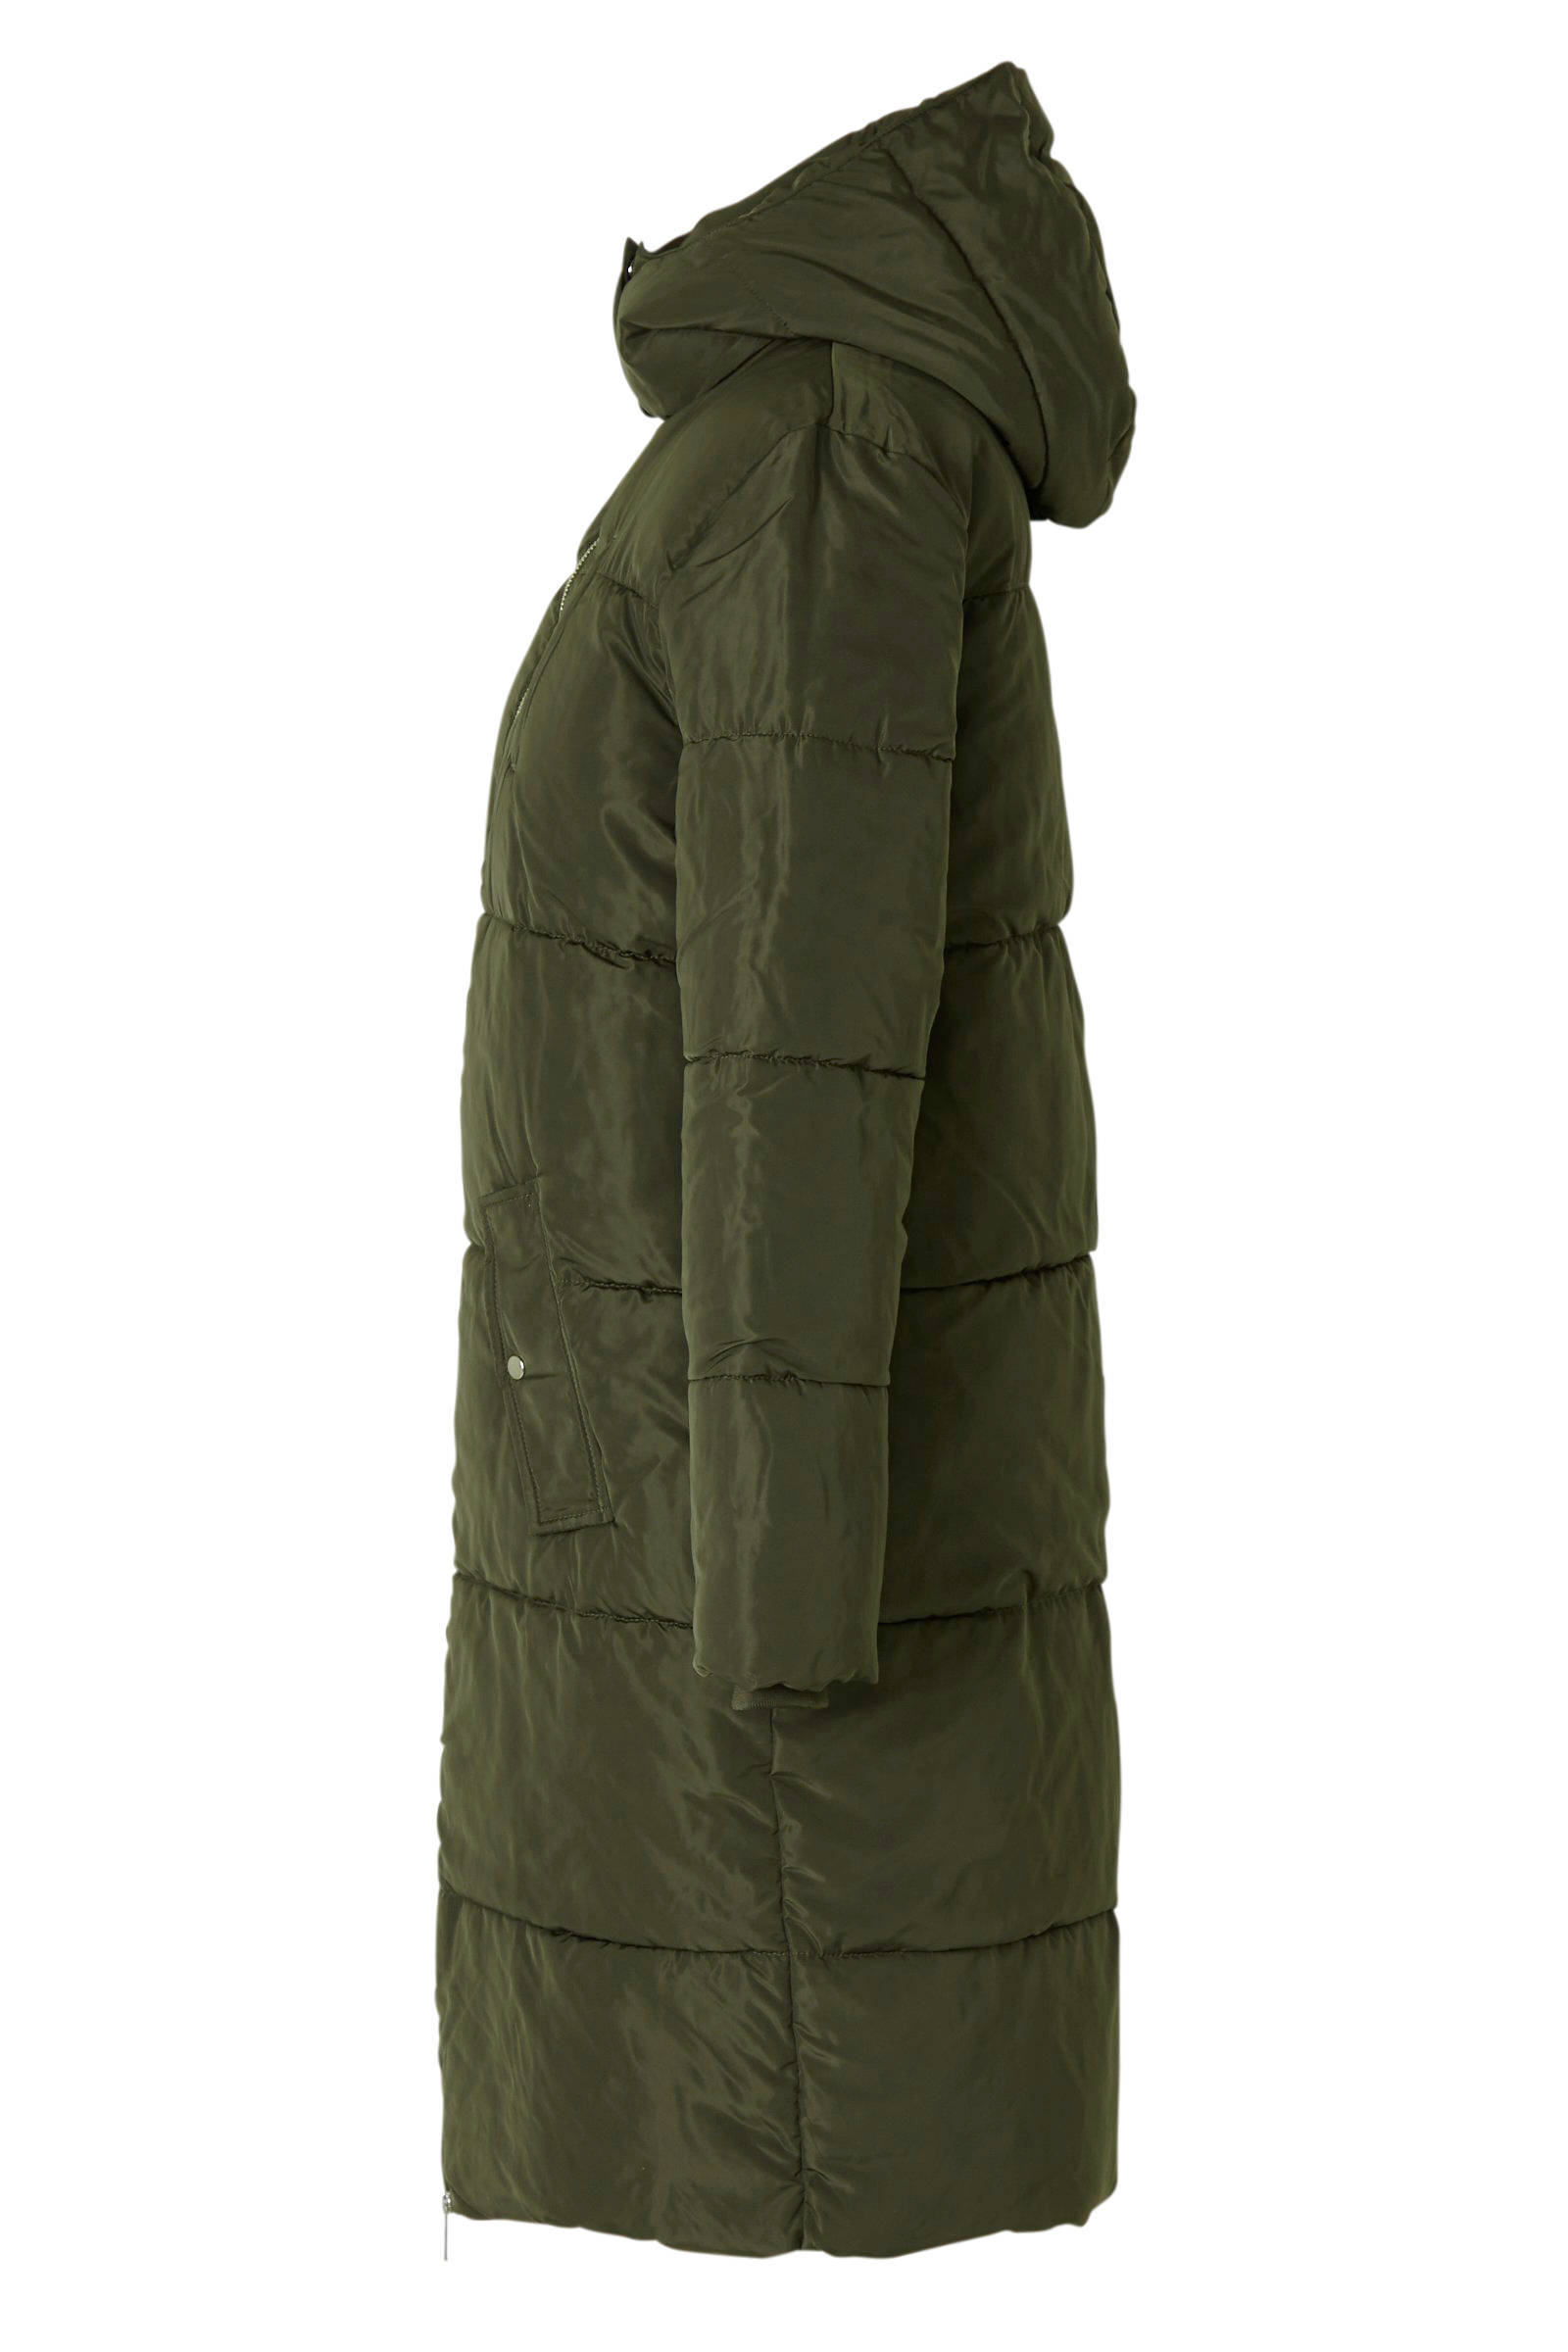 Modström winterjas Phoebe groen | wehkamp